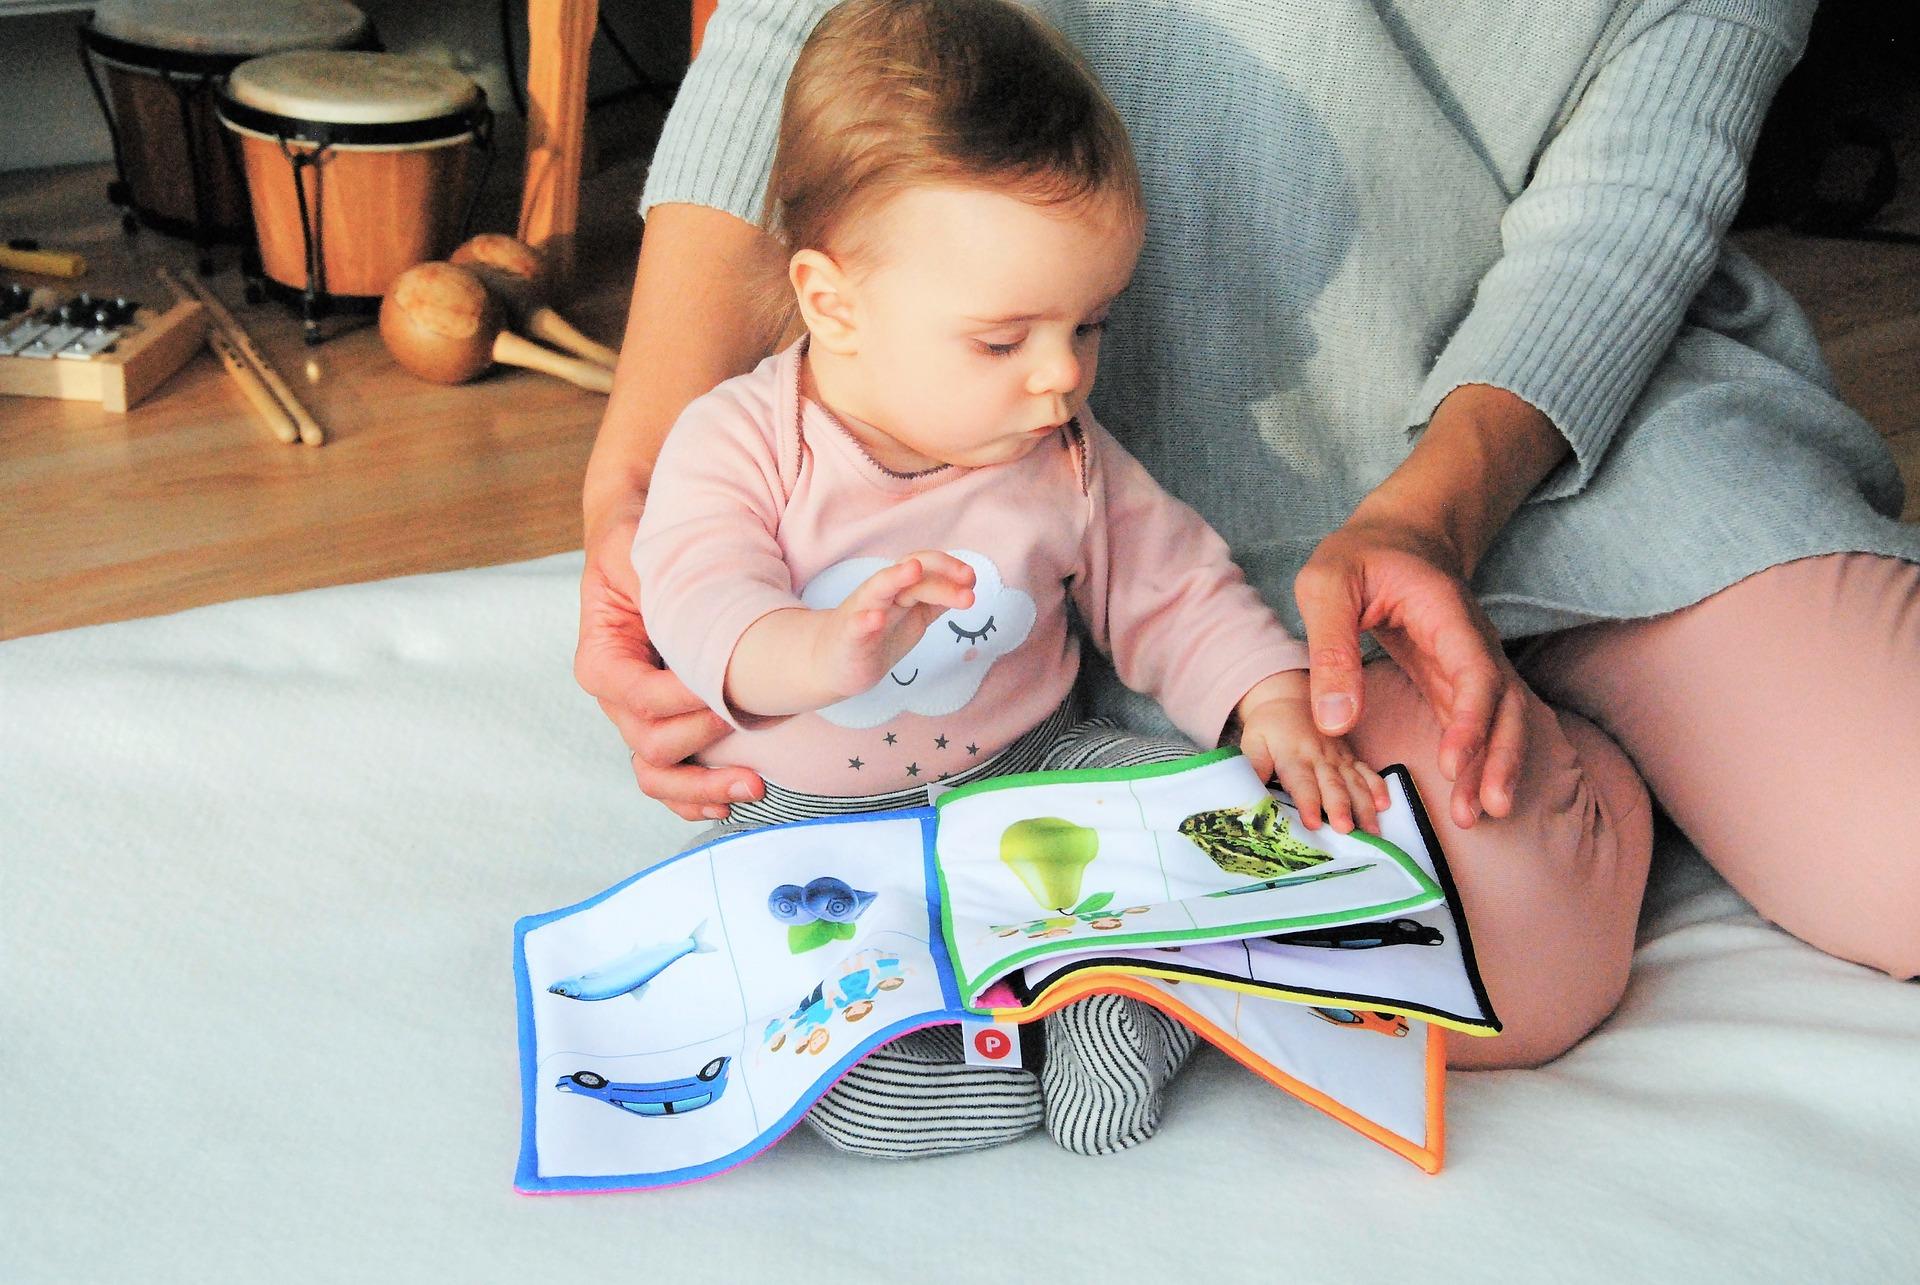 dete-drži-knjigu